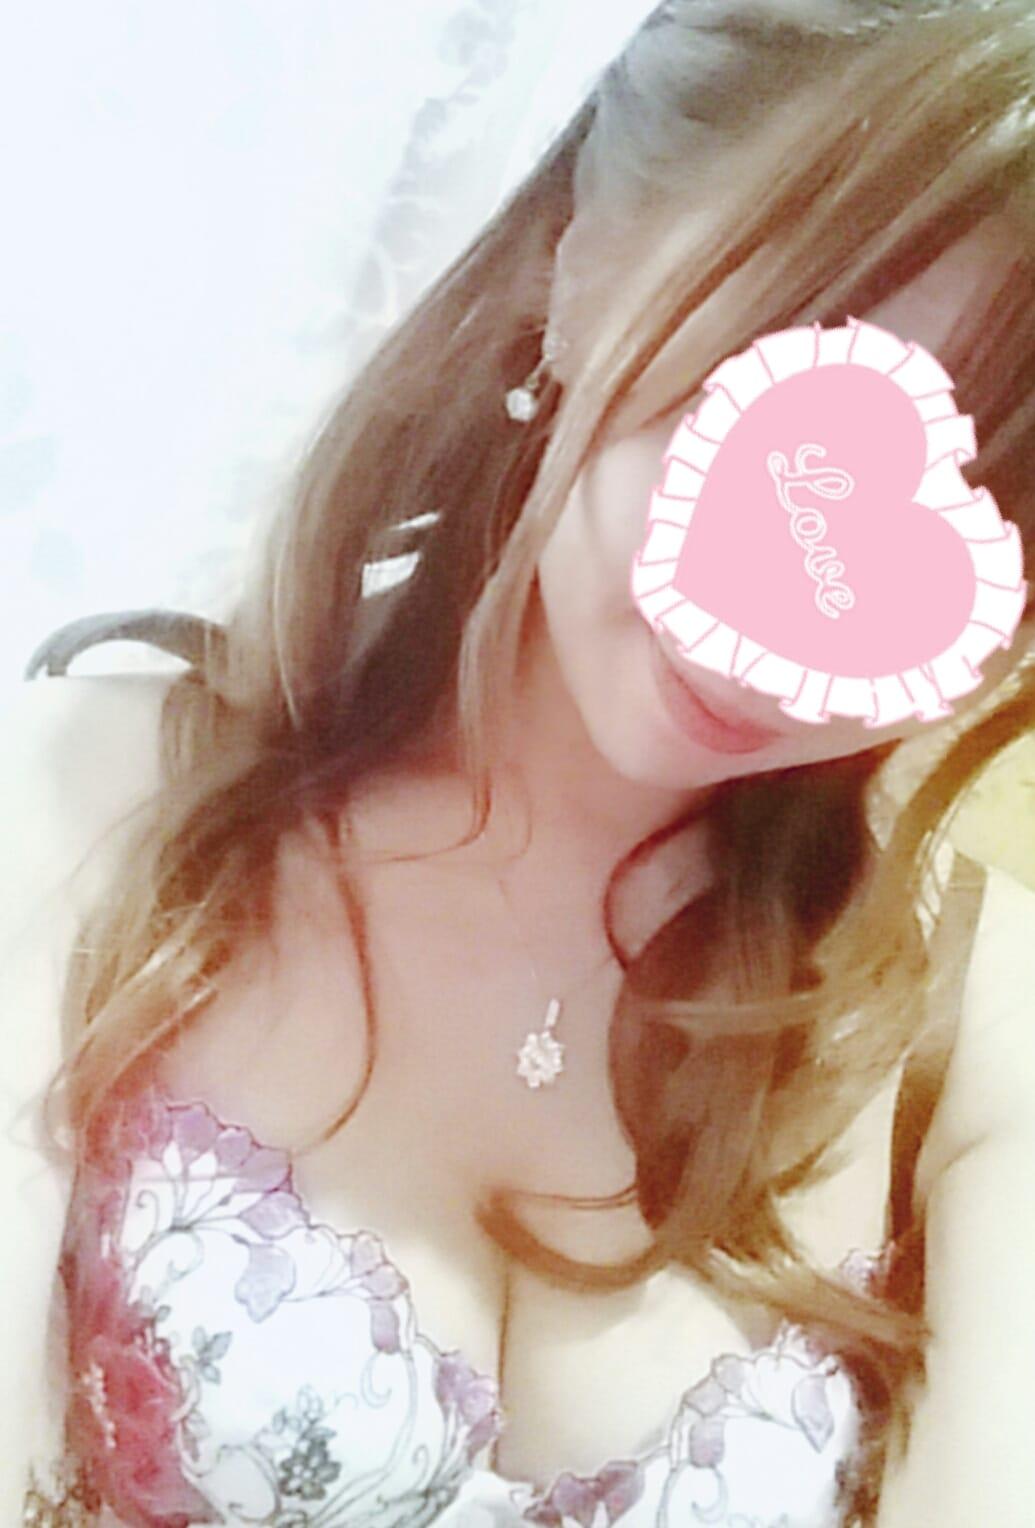 「Eve★log[撮影終了、出勤します♡]」09/26(09/26) 14:20   イヴの写メ・風俗動画